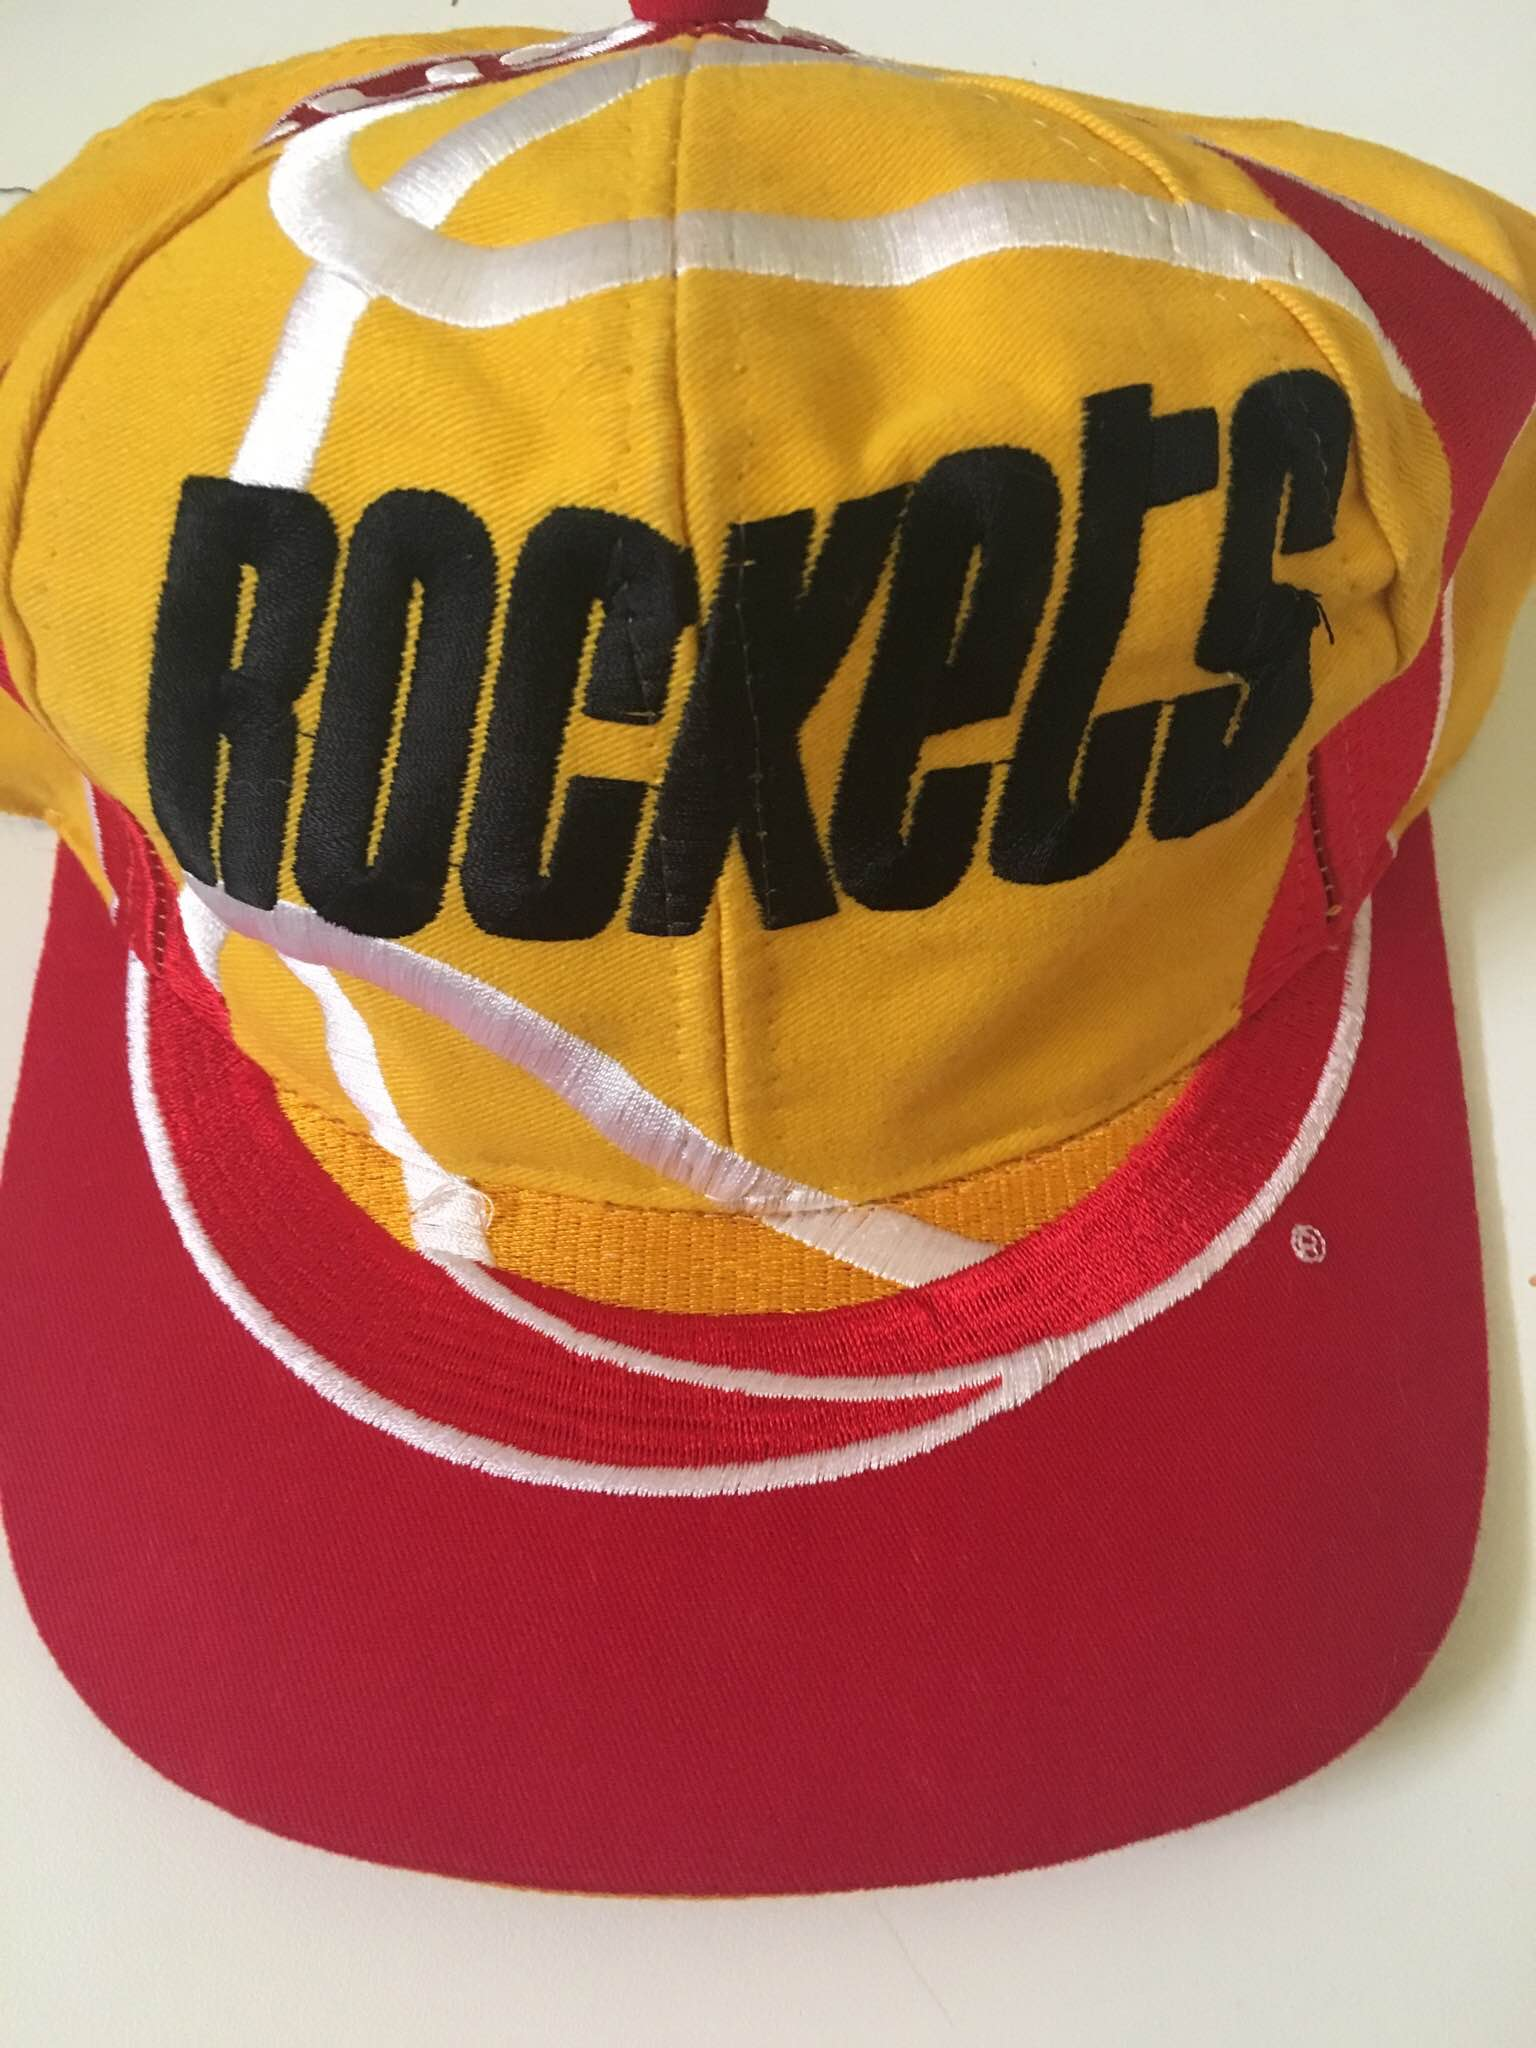 3328f1f247d94 Nba Rare Houston Rockets Vintage Snapback